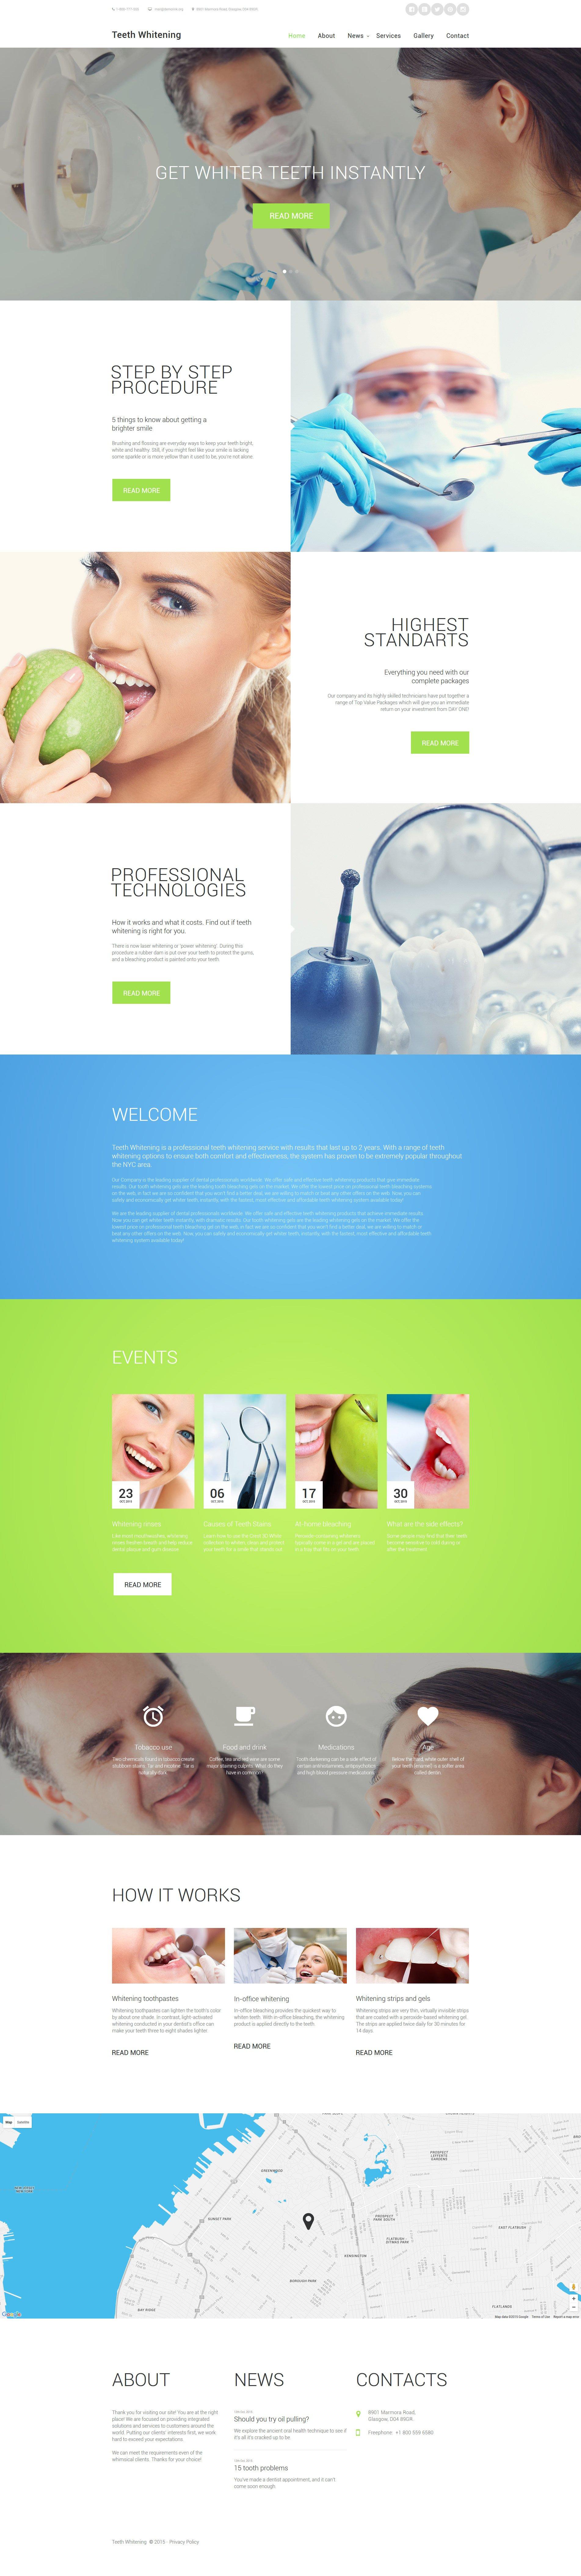 """Teeth Whitening"" modèle web adaptatif #58563"